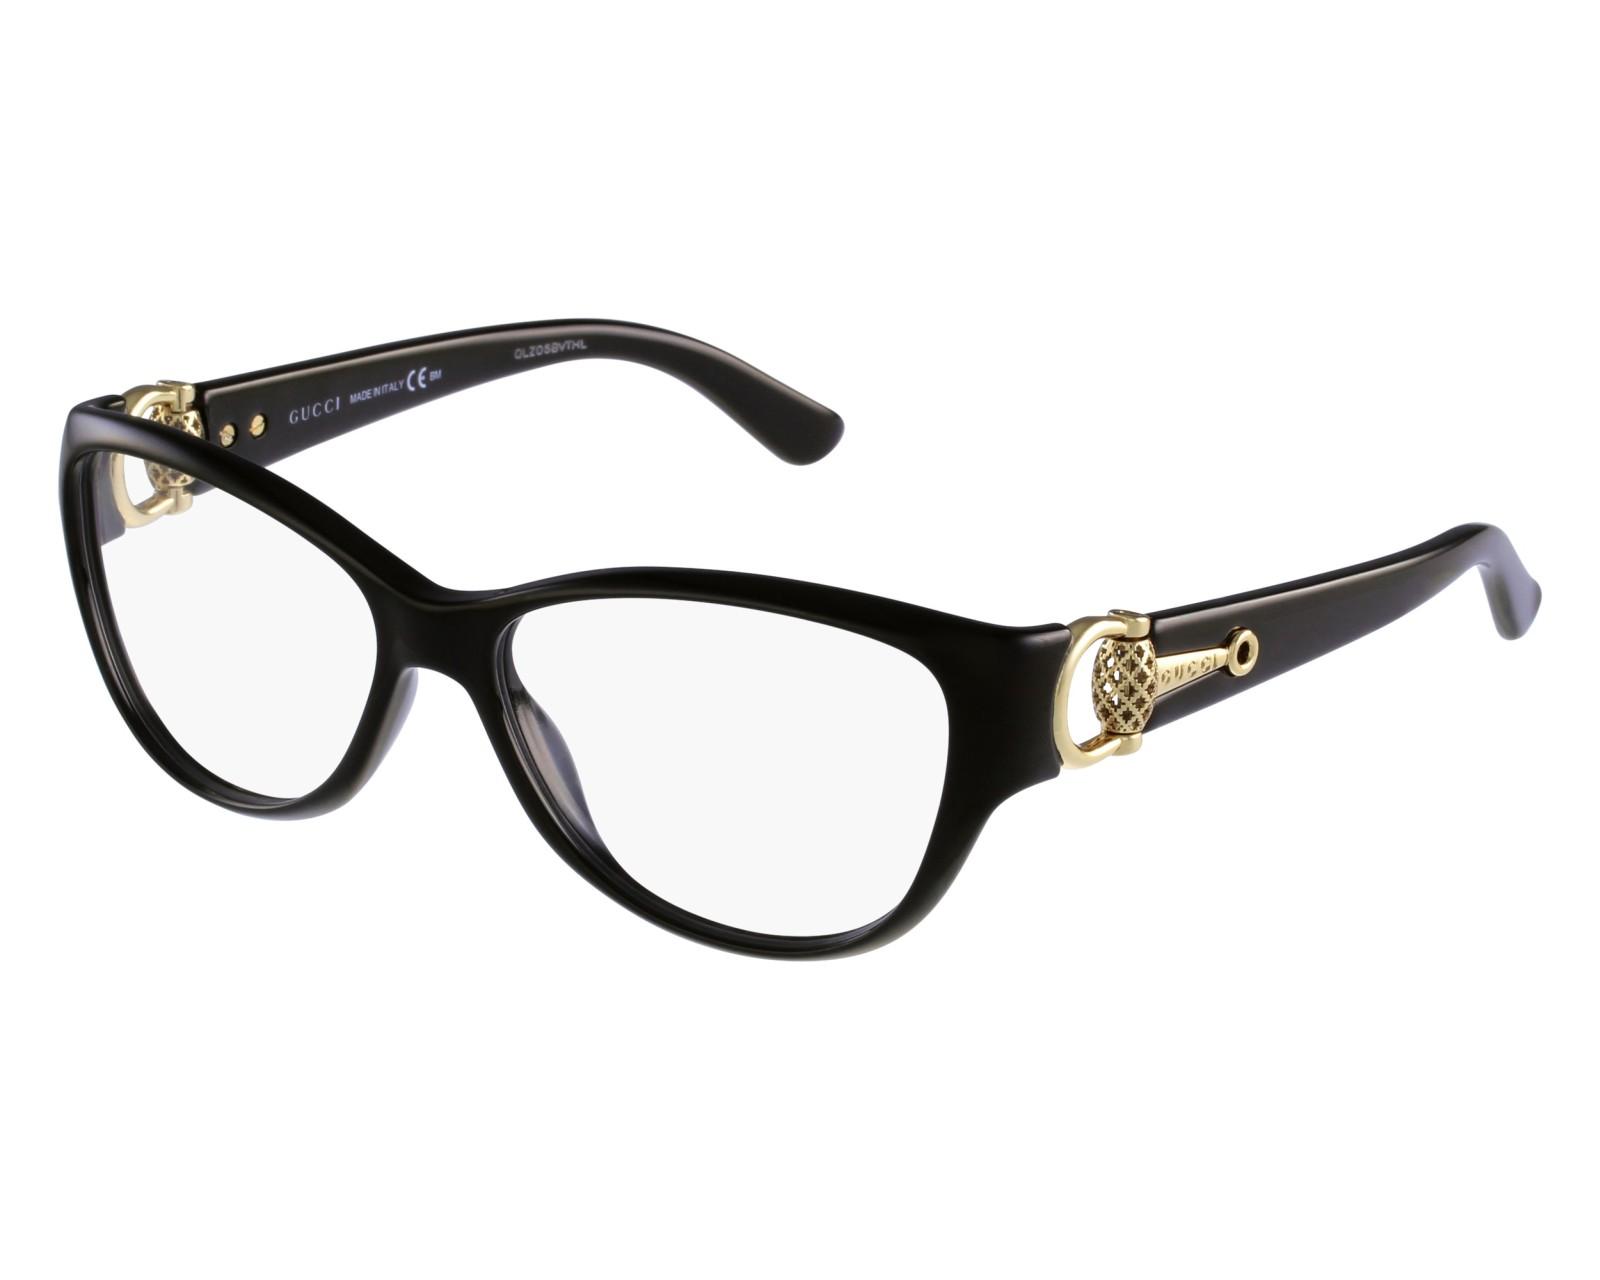 cc48c51f78e eyeglasses Gucci GG-3714 D28 - Black Gold front view